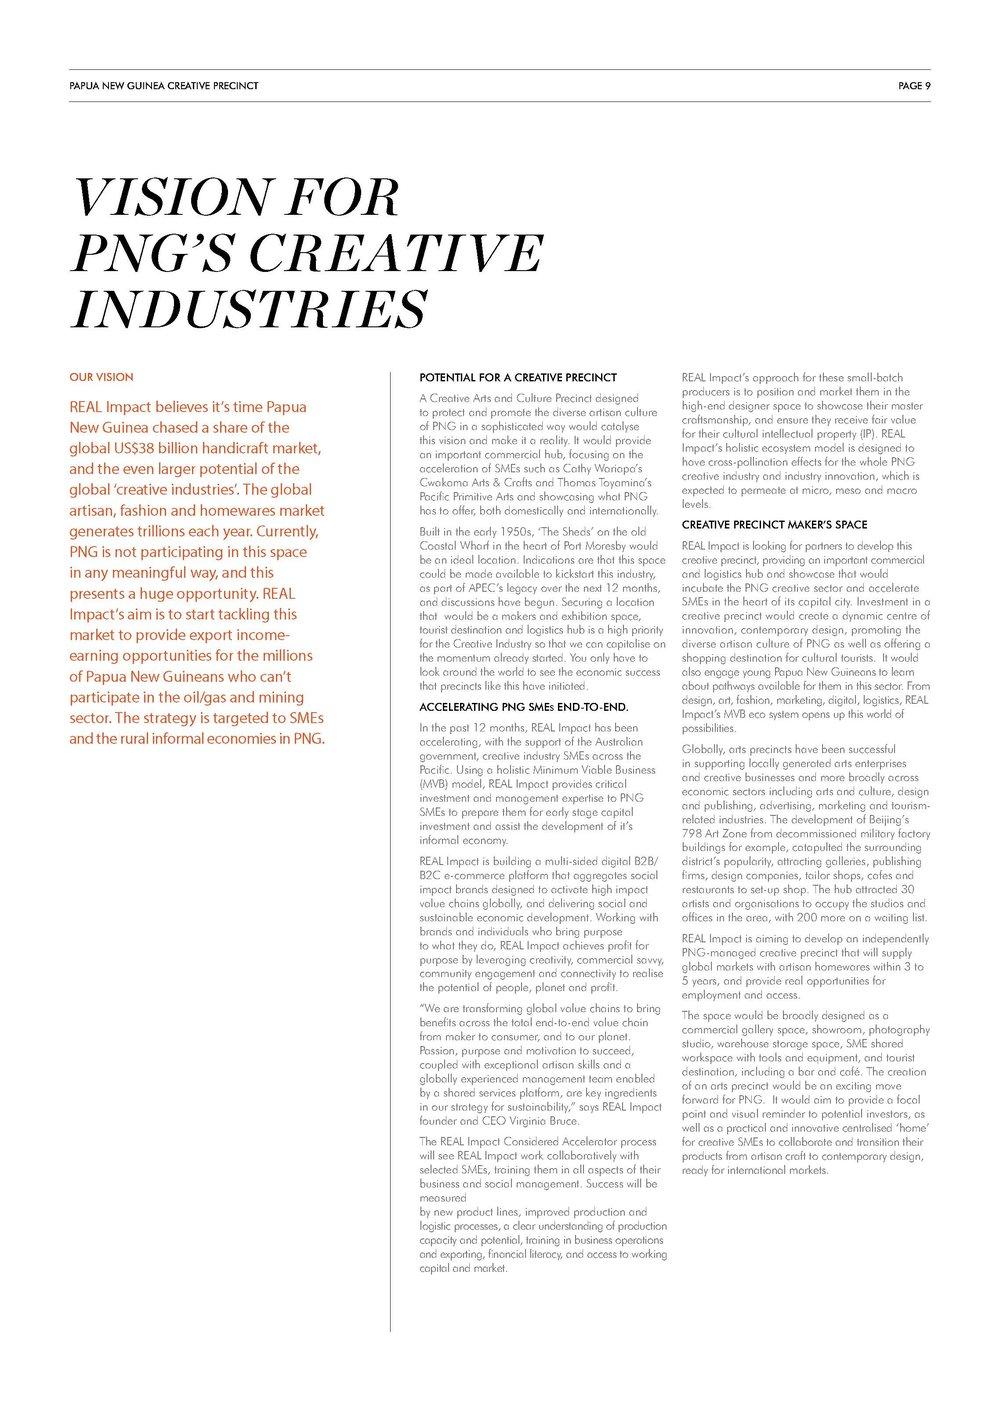 REAL Impact News Design5_Print Small image_Page_10.jpg